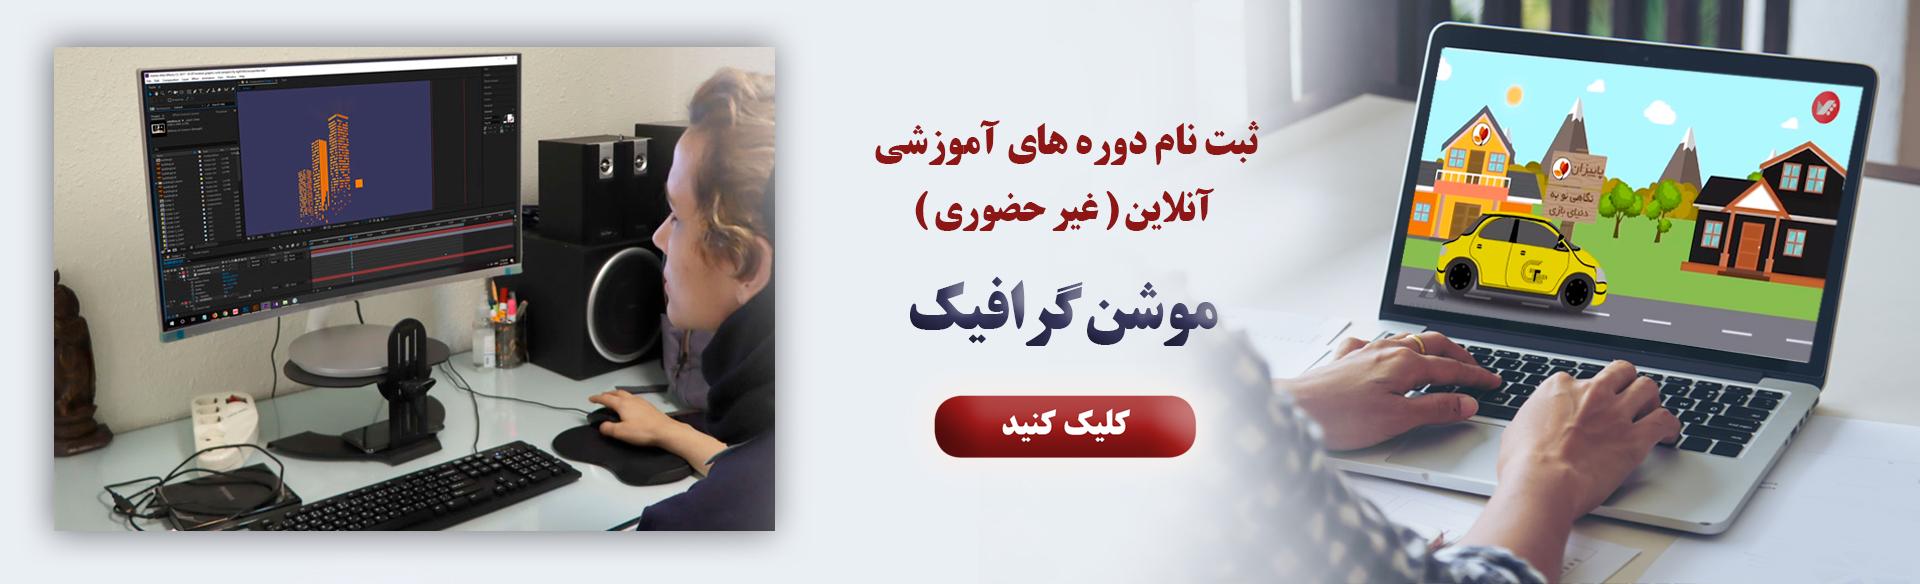 norooz moshen graphic online class - آموزش